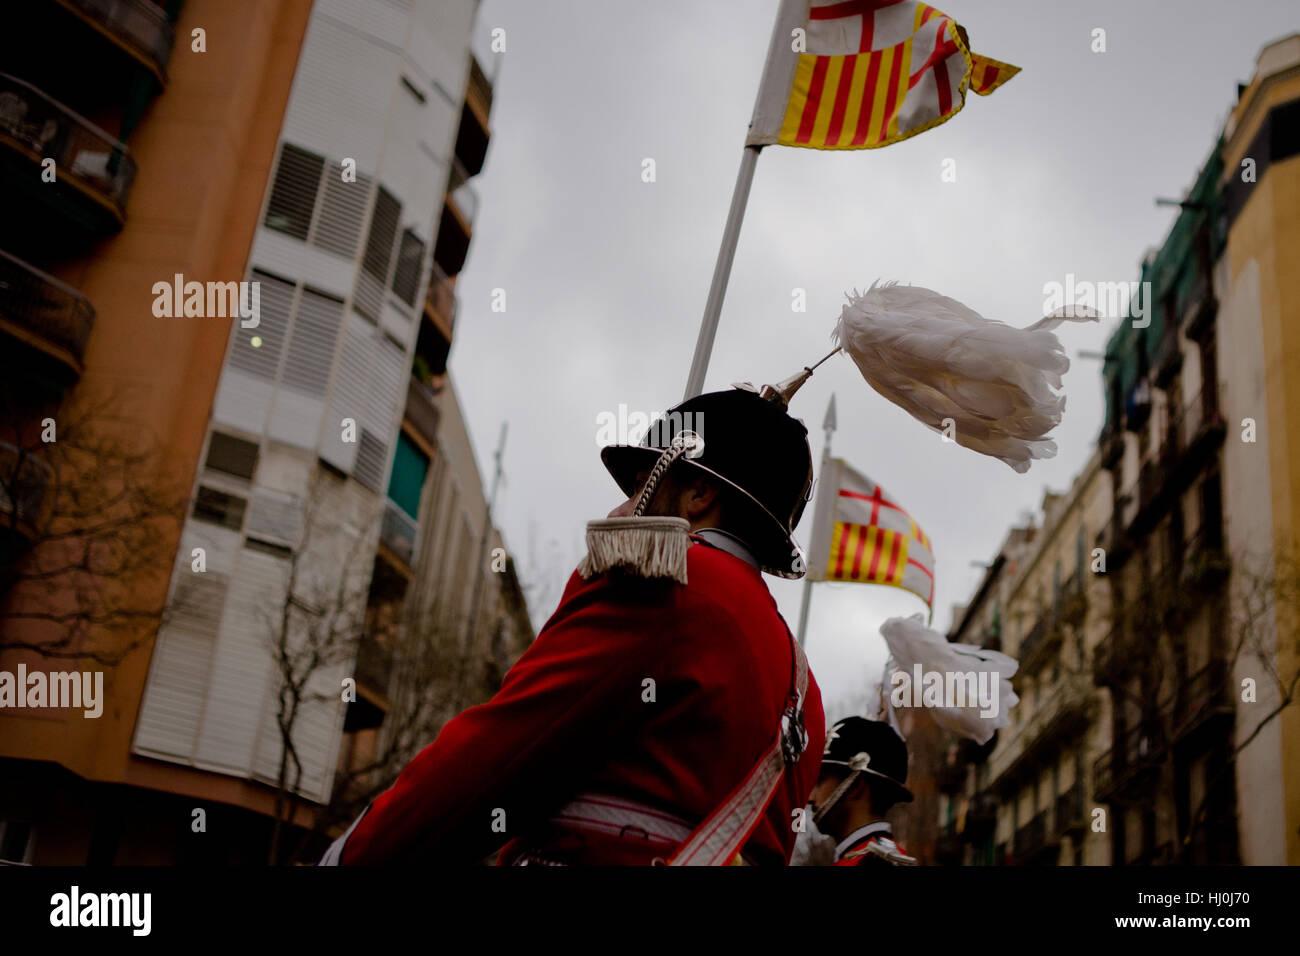 Barcelona, Spain. 21st Jan, 2017. January 21, 2017 - Barcelona, Catalonia, Spain - Members of the Barcelona municipal Stock Photo